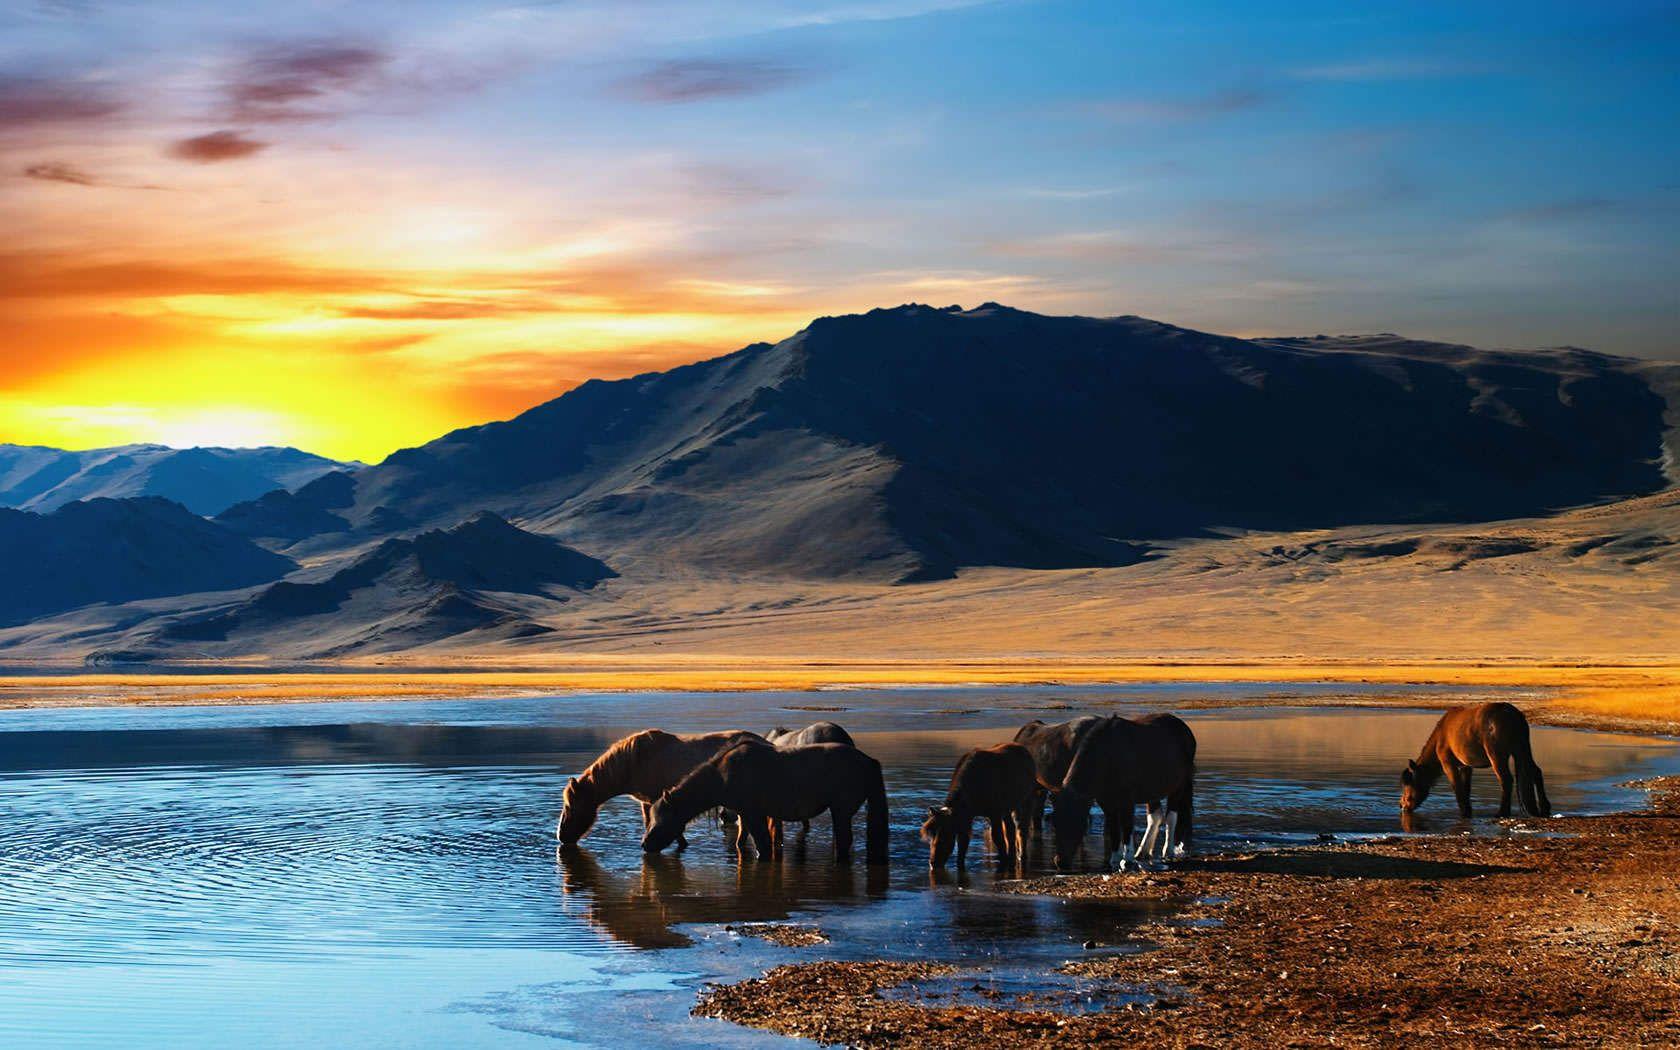 Breathtaking Nature Scenes